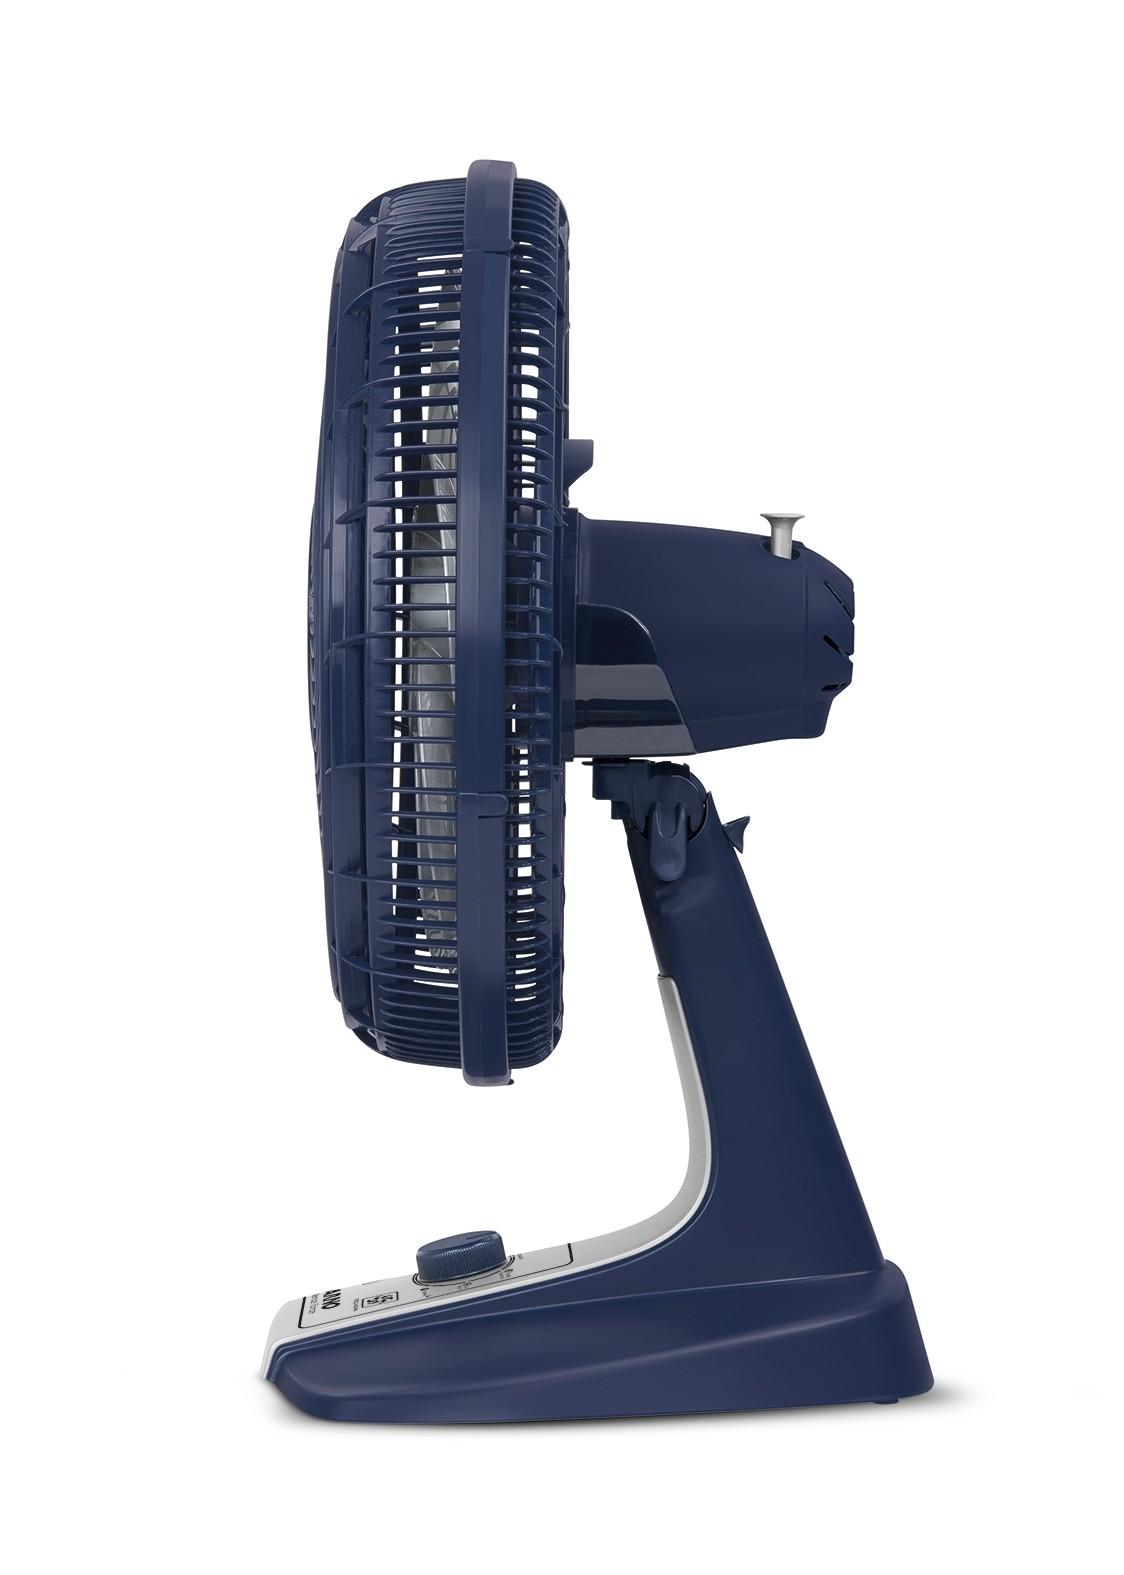 Ventilador Silence Force Arno - VF45 - 127V